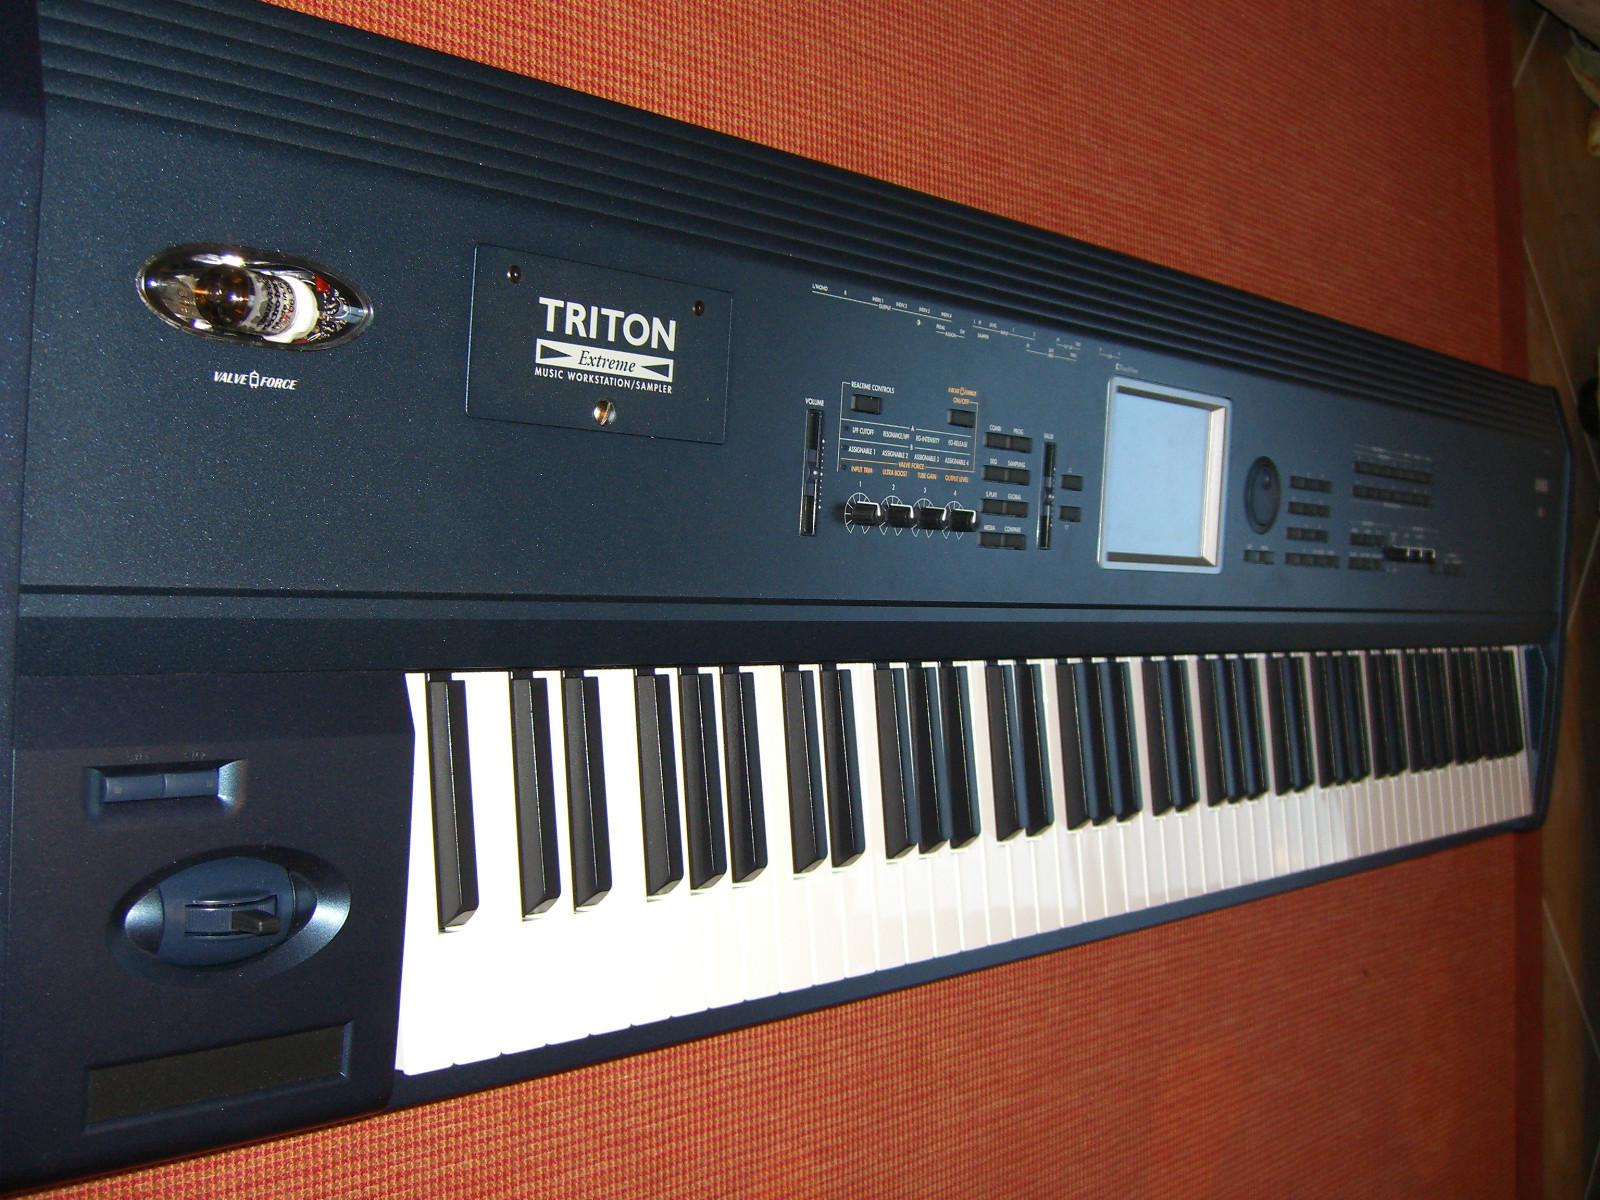 matrixsynth b korg triton extreme 88 keyboard workstation synthesizer rh b matrixsynth com korg triton extreme 88 review Korg Triton Extreme 61